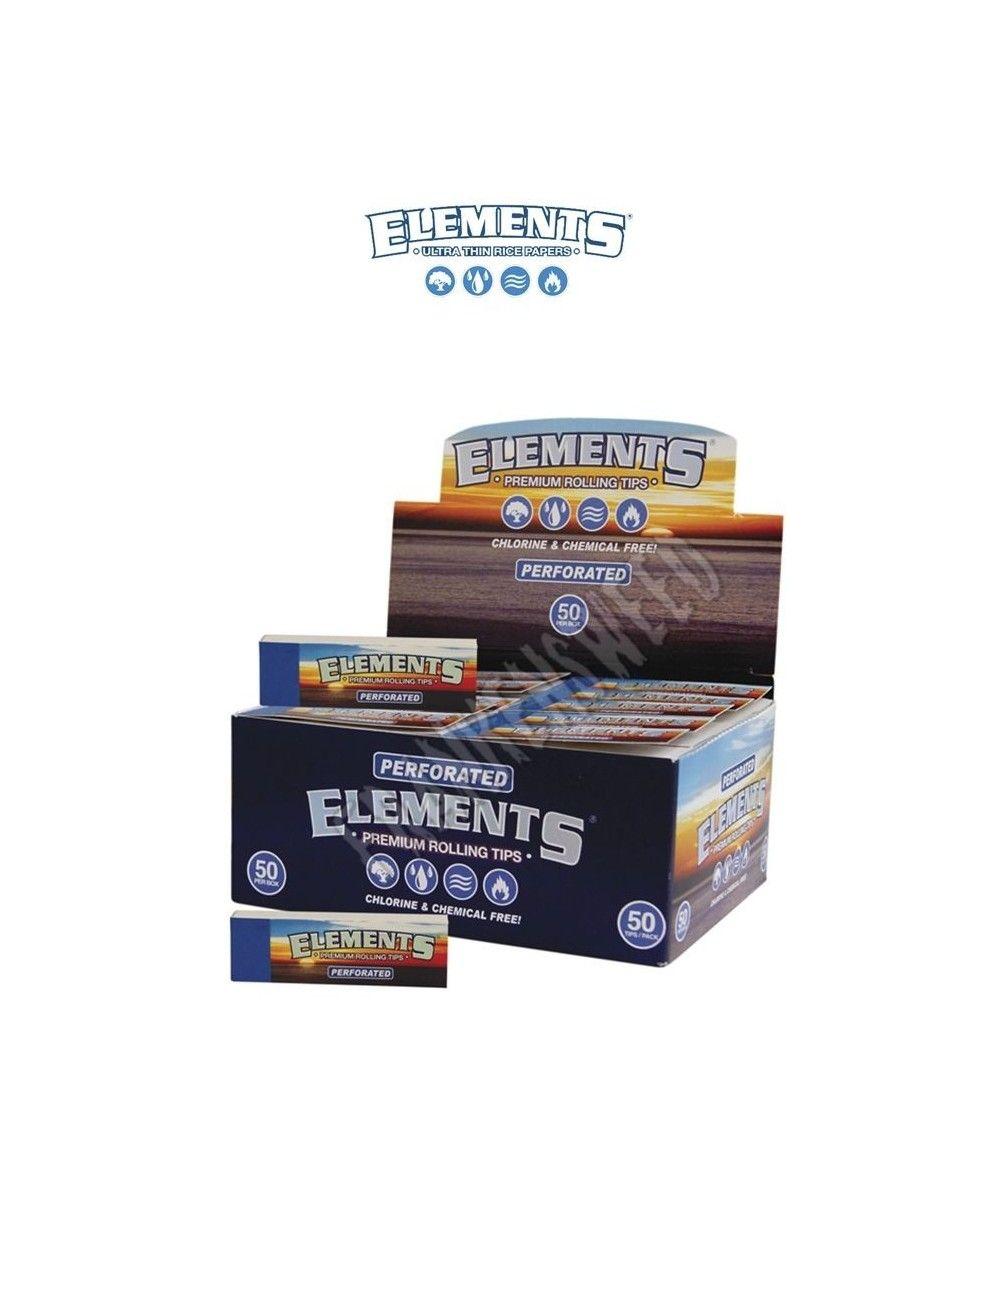 Comprar caja de boquillas elements tips perforated en España en Frankensweed Shop Online.